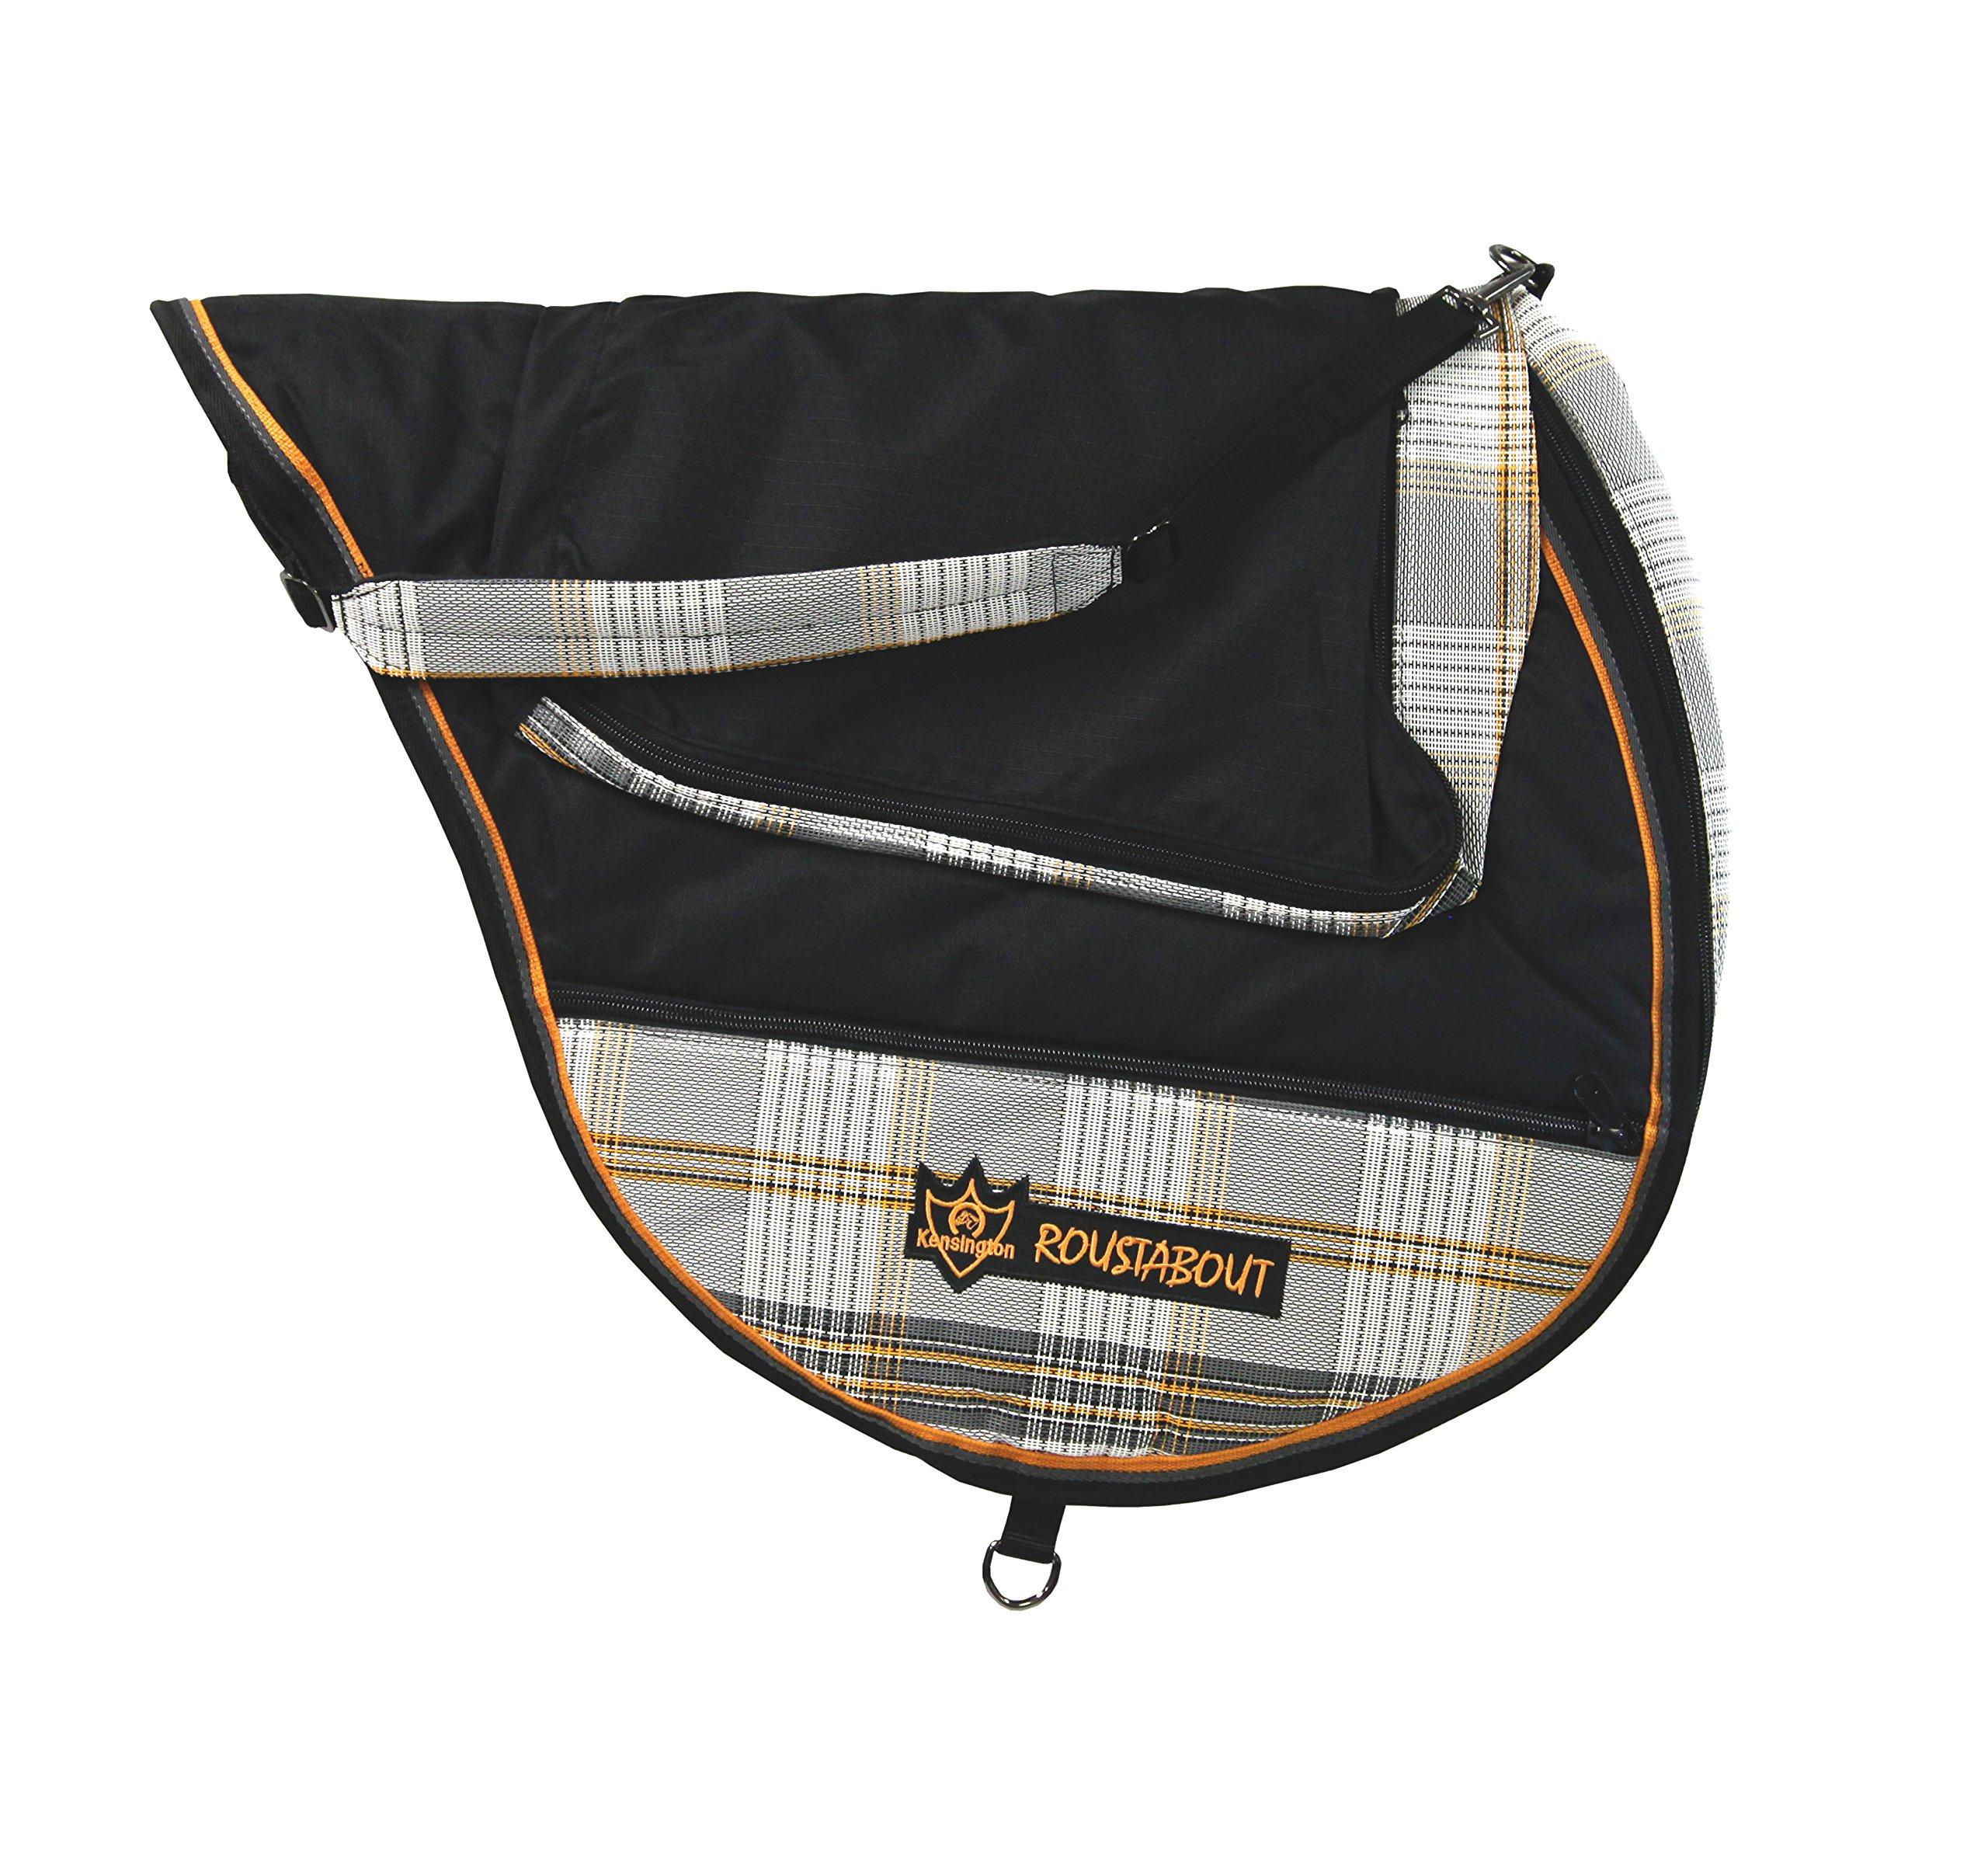 Kensington All Purpose Saddle Carry Bag, Black/Citrus Slate, One Size